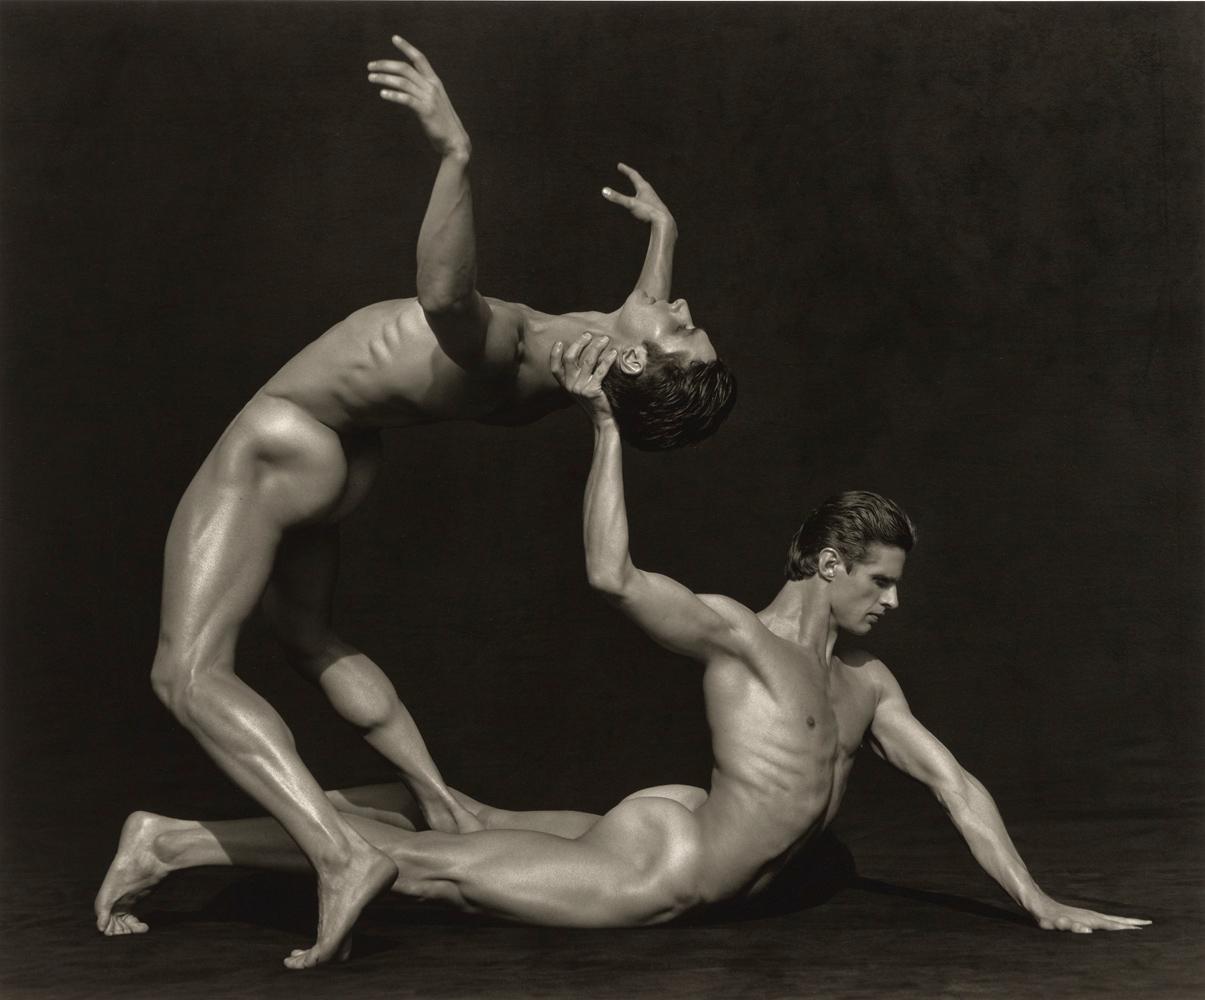 Pierre and Yuri, Los Angeles, 1999